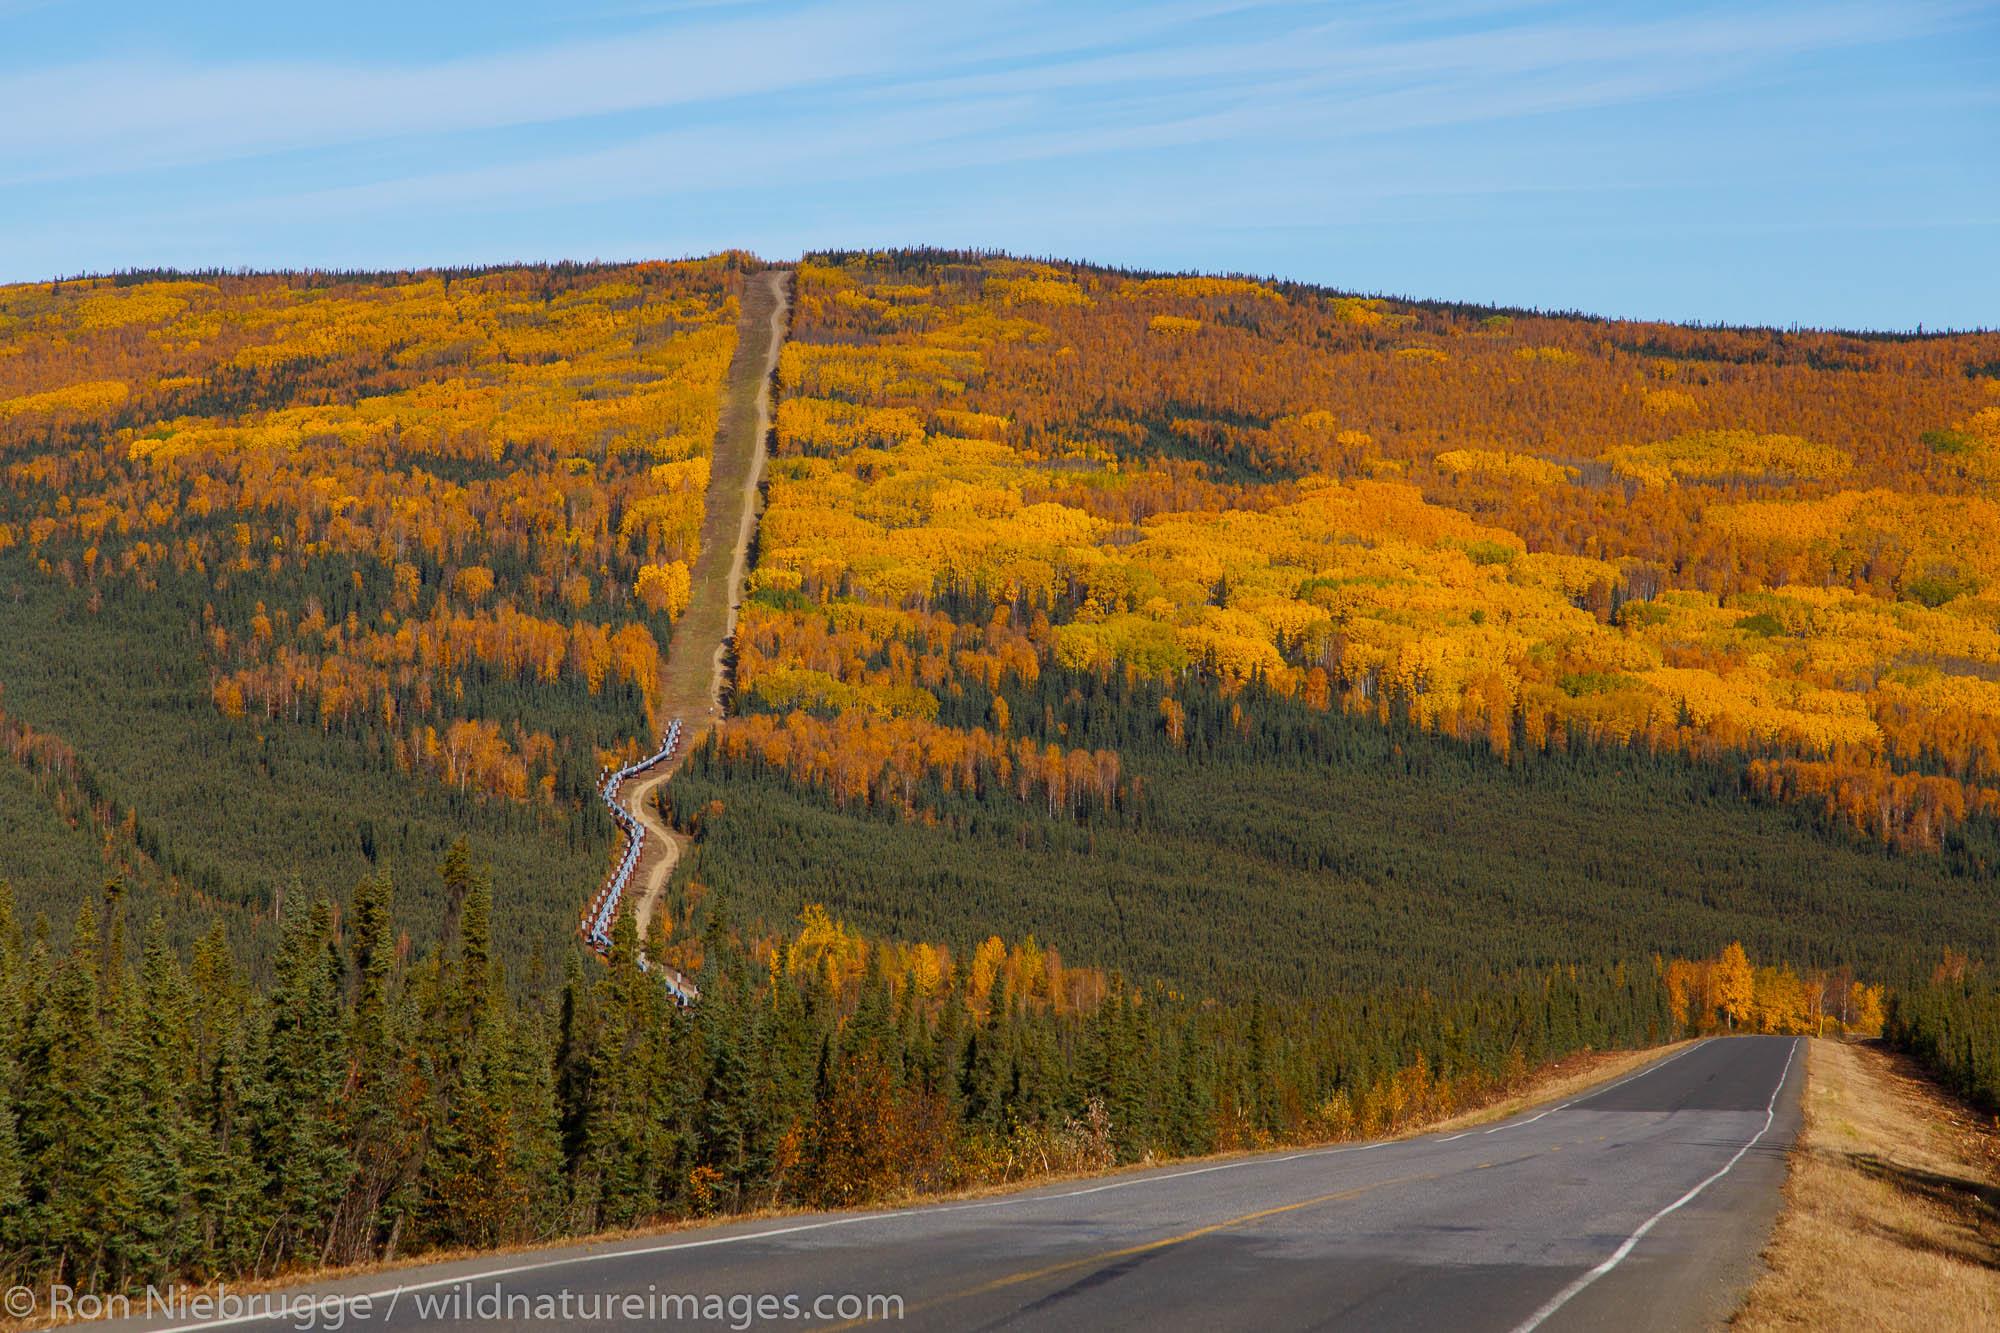 Alyeska Pipeline along the Dalton Highway, Alaska.